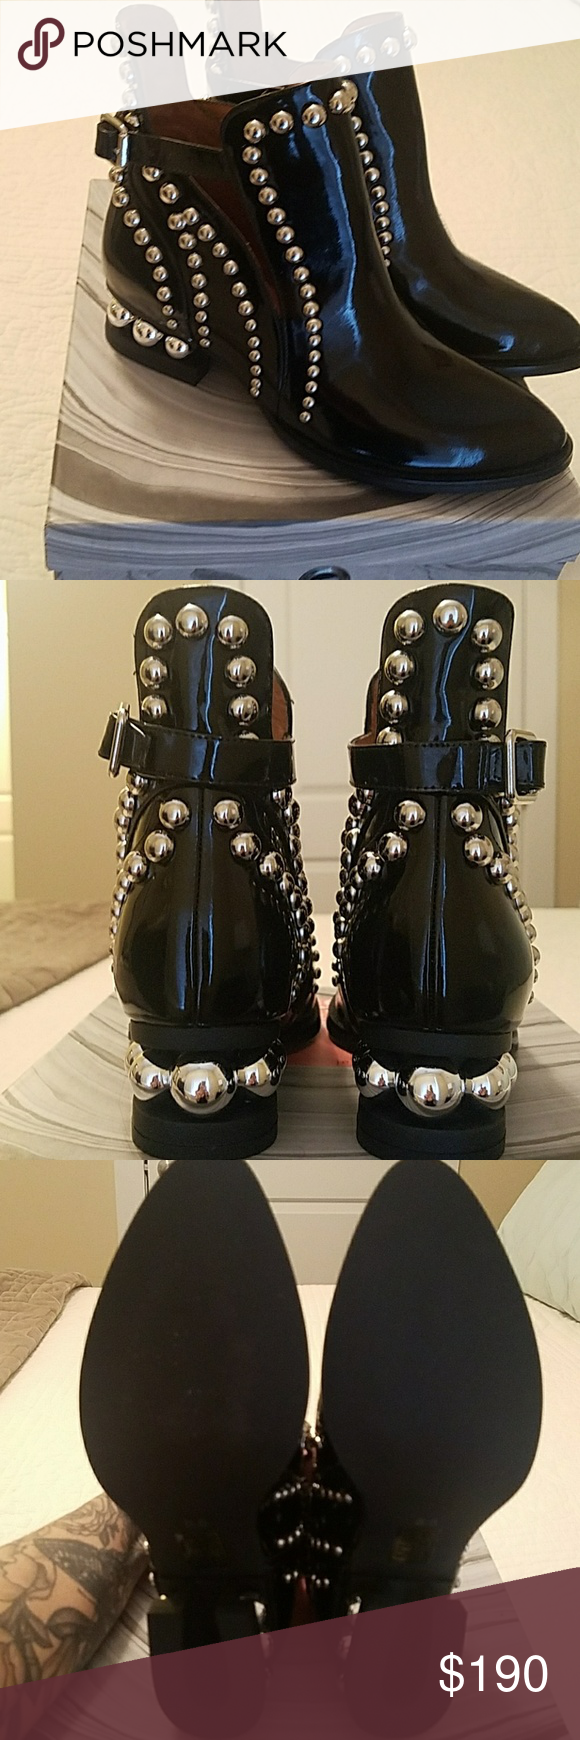 NIB Jeffrey Campbell Rylance-MB Boots Beautiful patent leather 0caa0ca2d